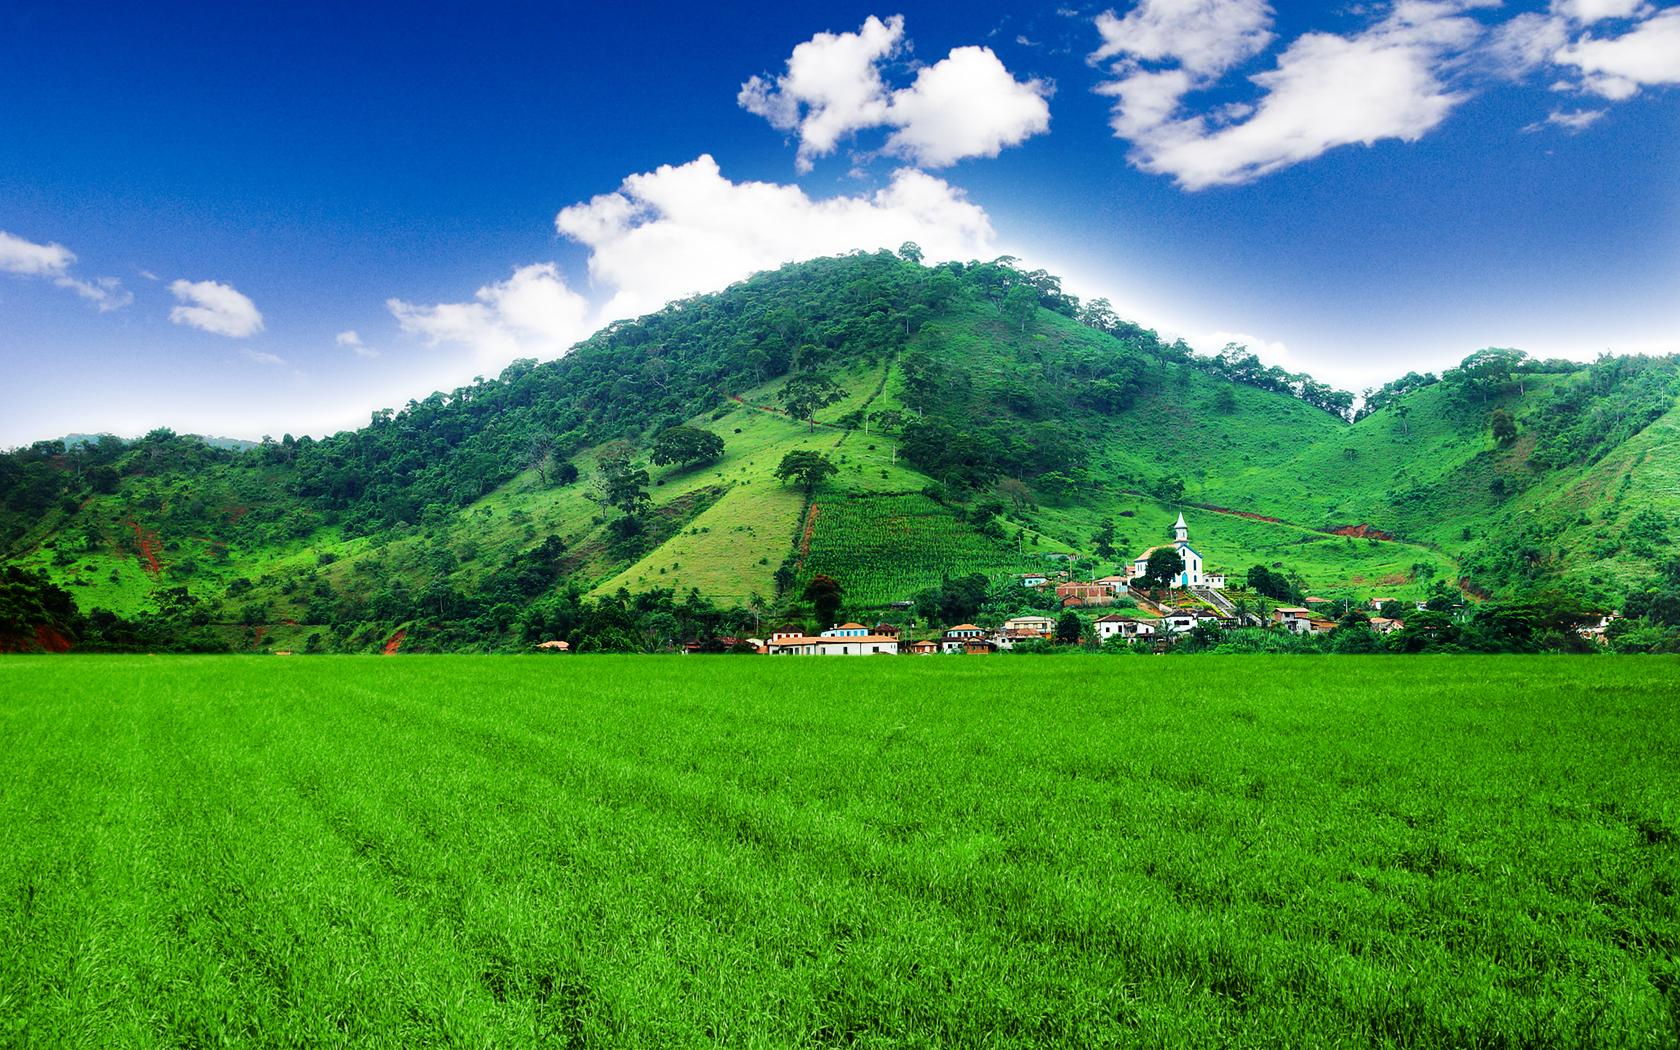 My bliss: the mountain villa by rthaut